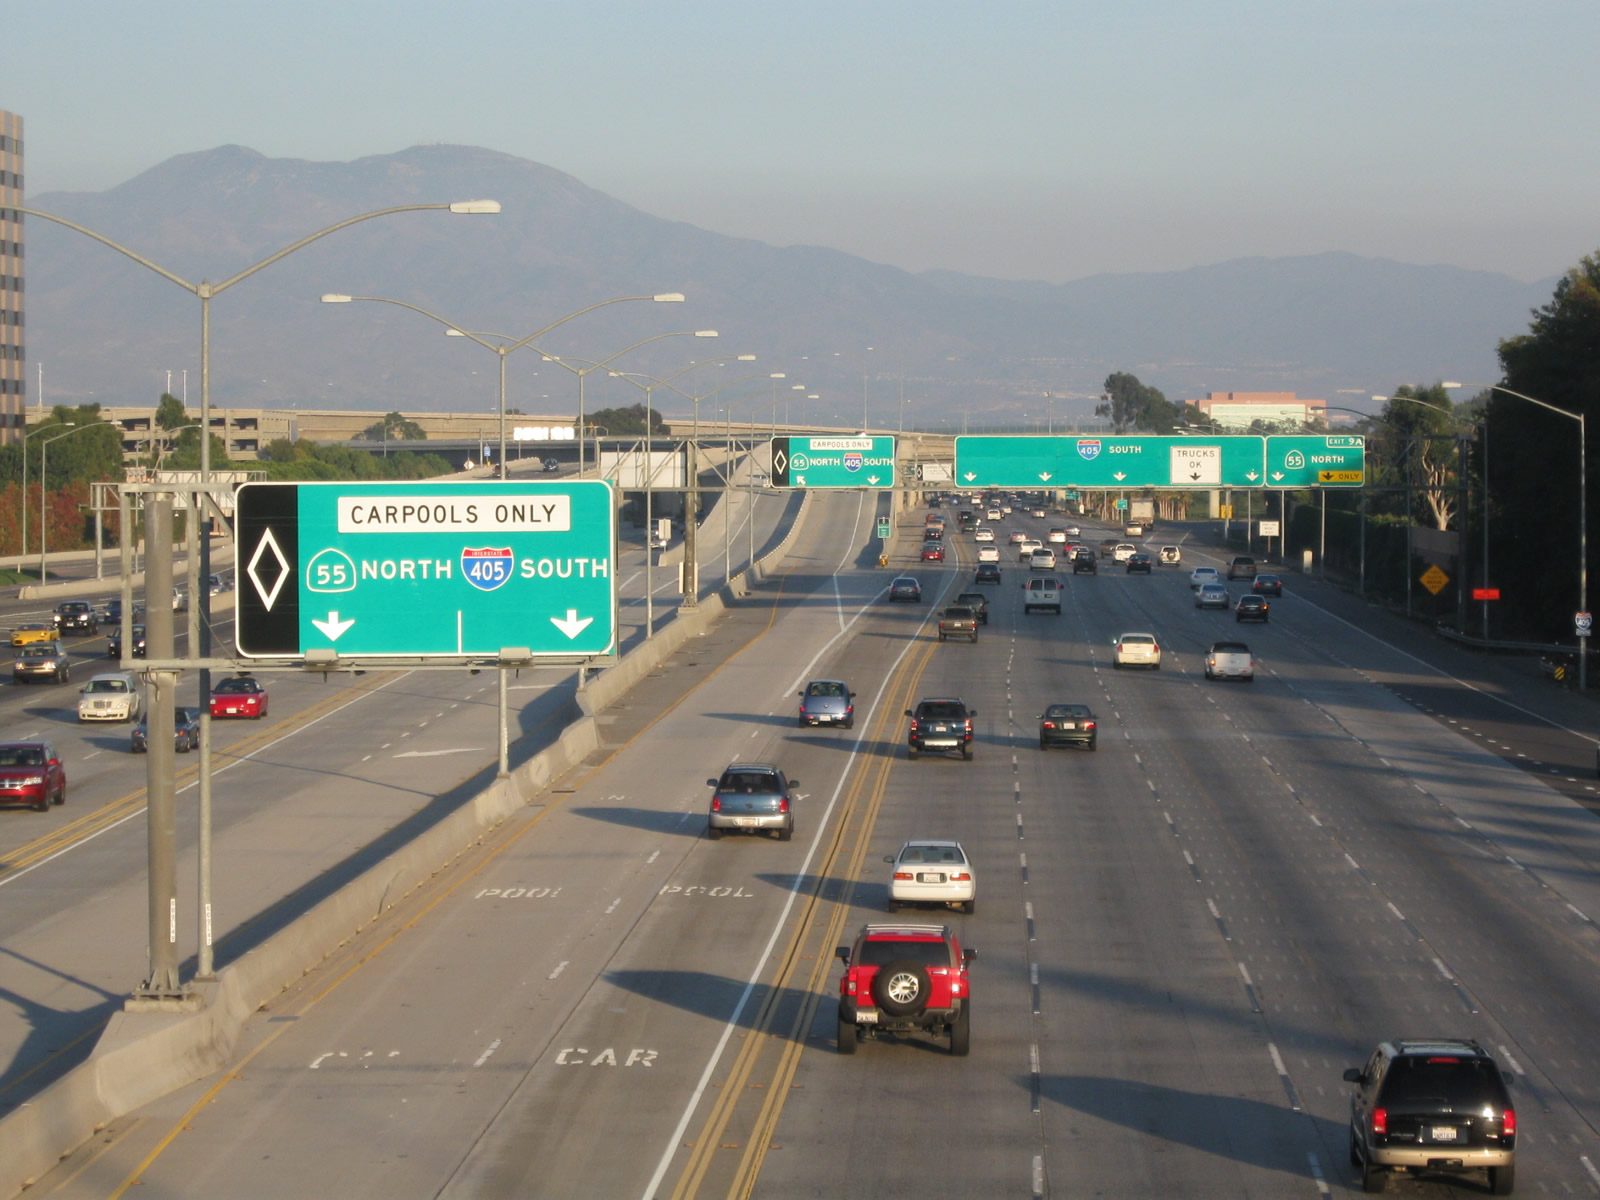 i-405_sb_exit_009a_11 Caltrans Live Traffic Map on txdot traffic map, modot traffic map, san francisco traffic map, ohio dot traffic map, wsdot traffic map, faa traffic map, seattle traffic map,